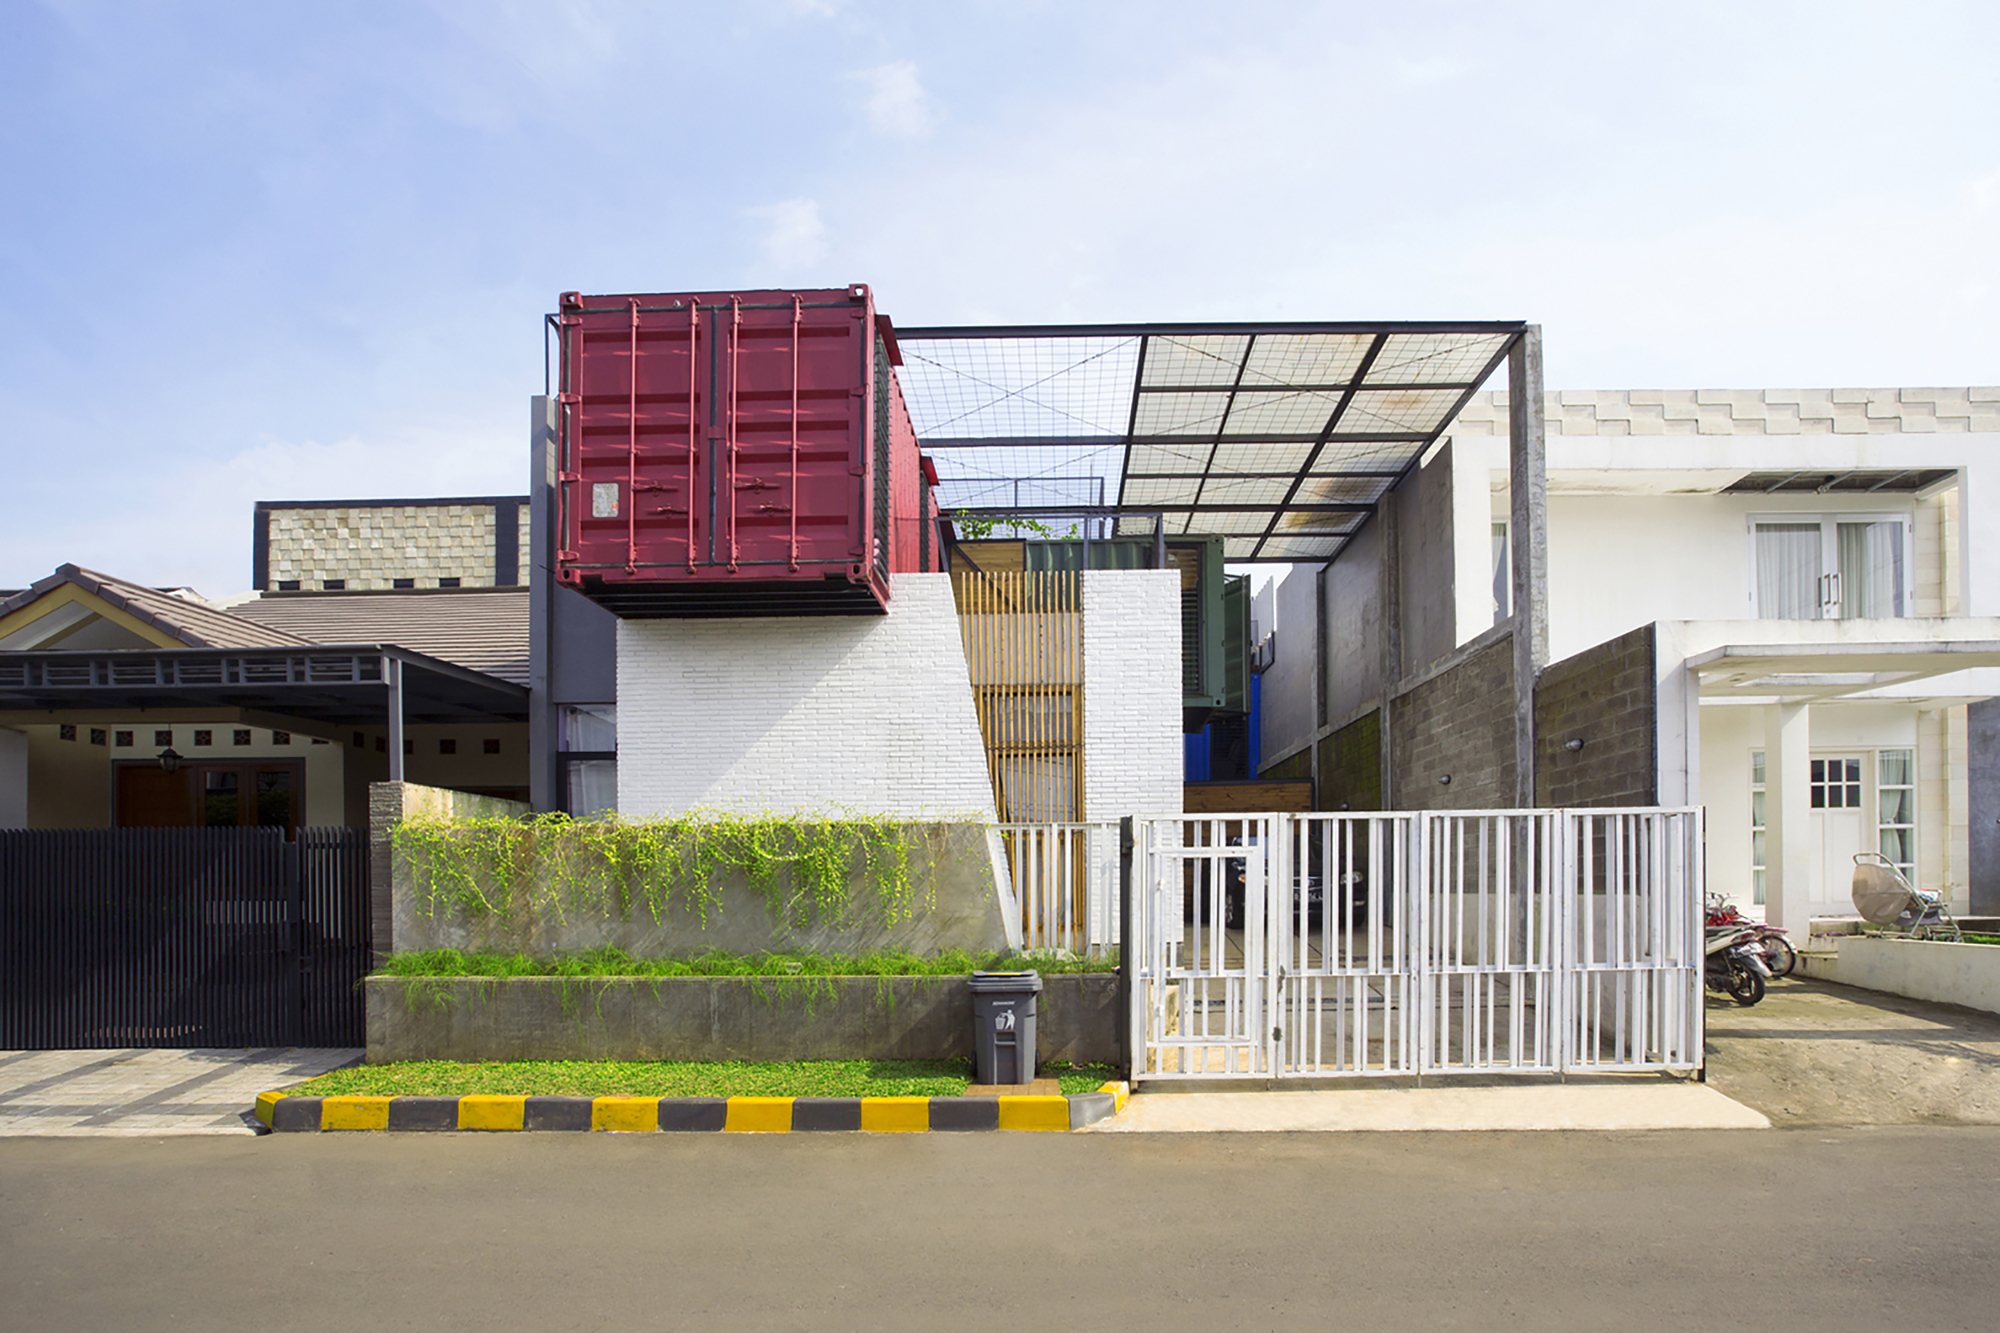 Container para la vida urbana / Atelier Riri